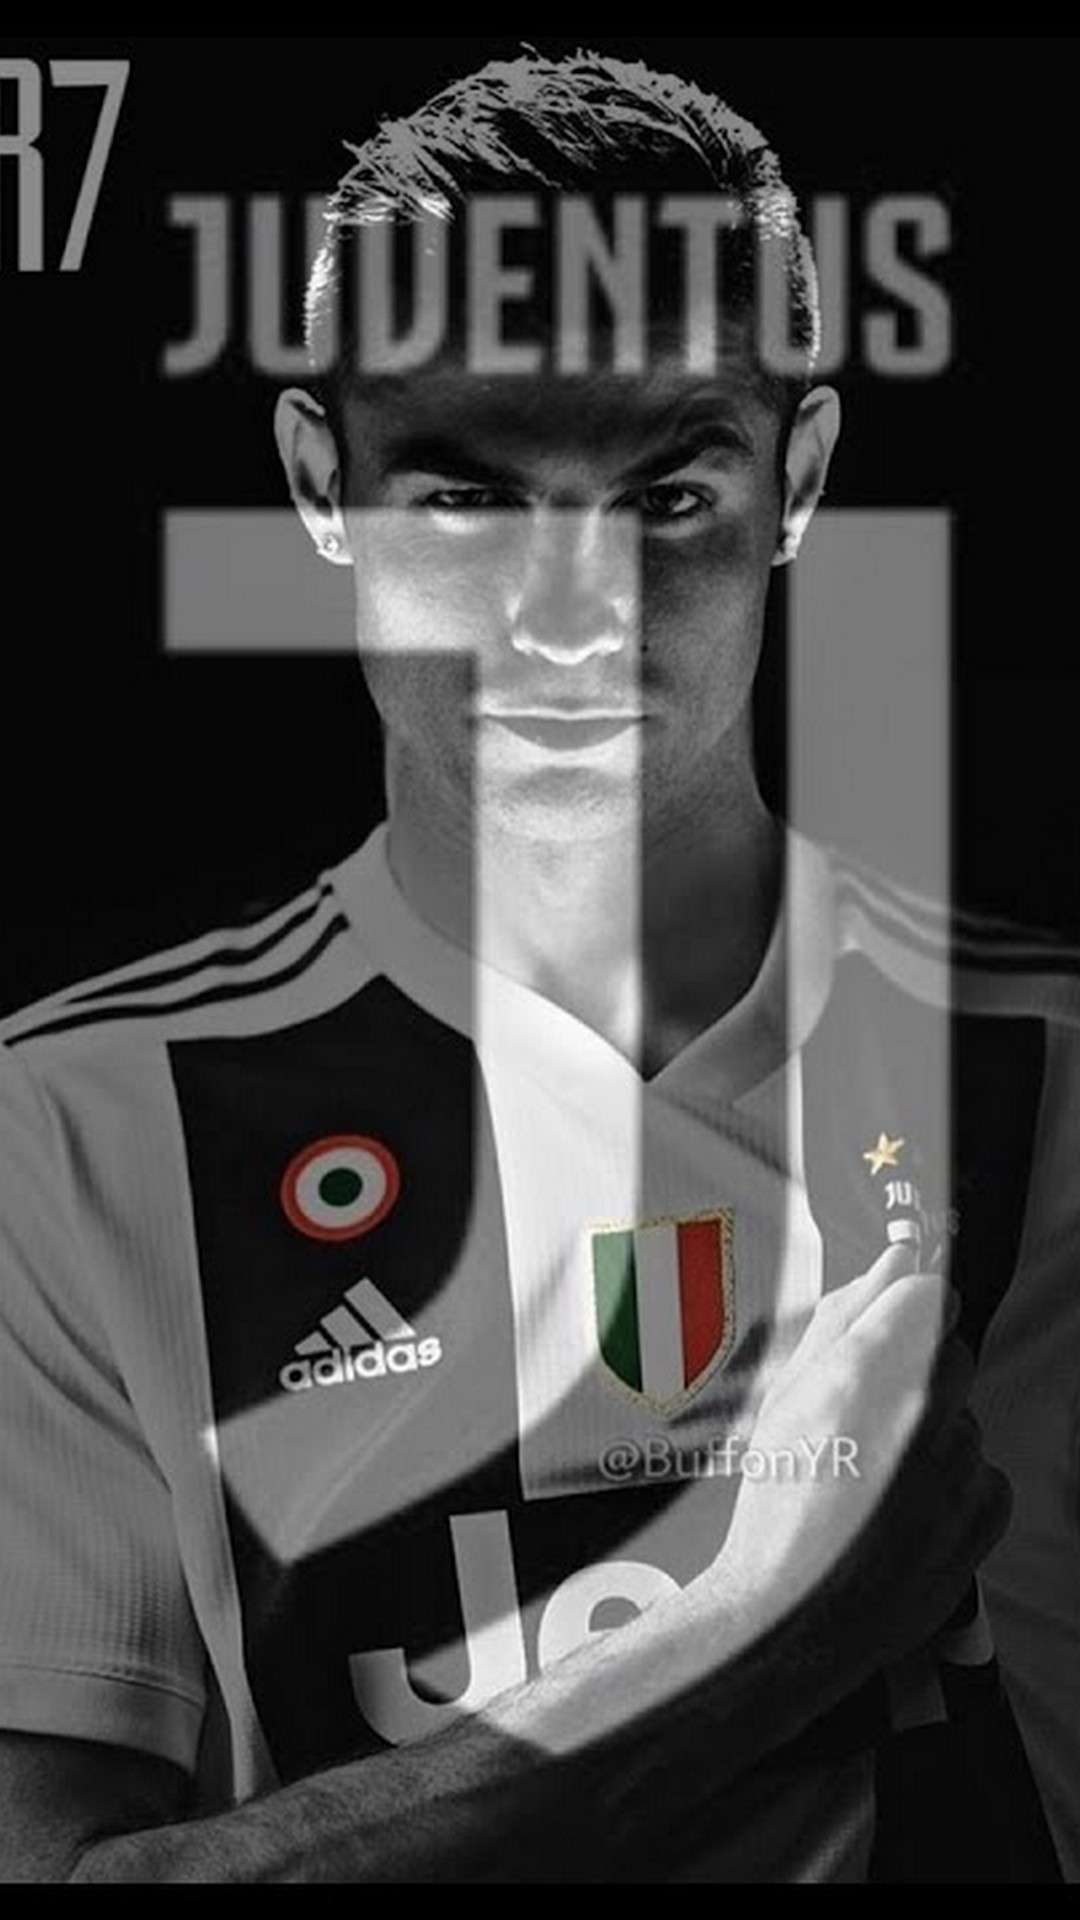 Free Download C Ronaldo Juventus Wallpaper For Iphone 2019 3d